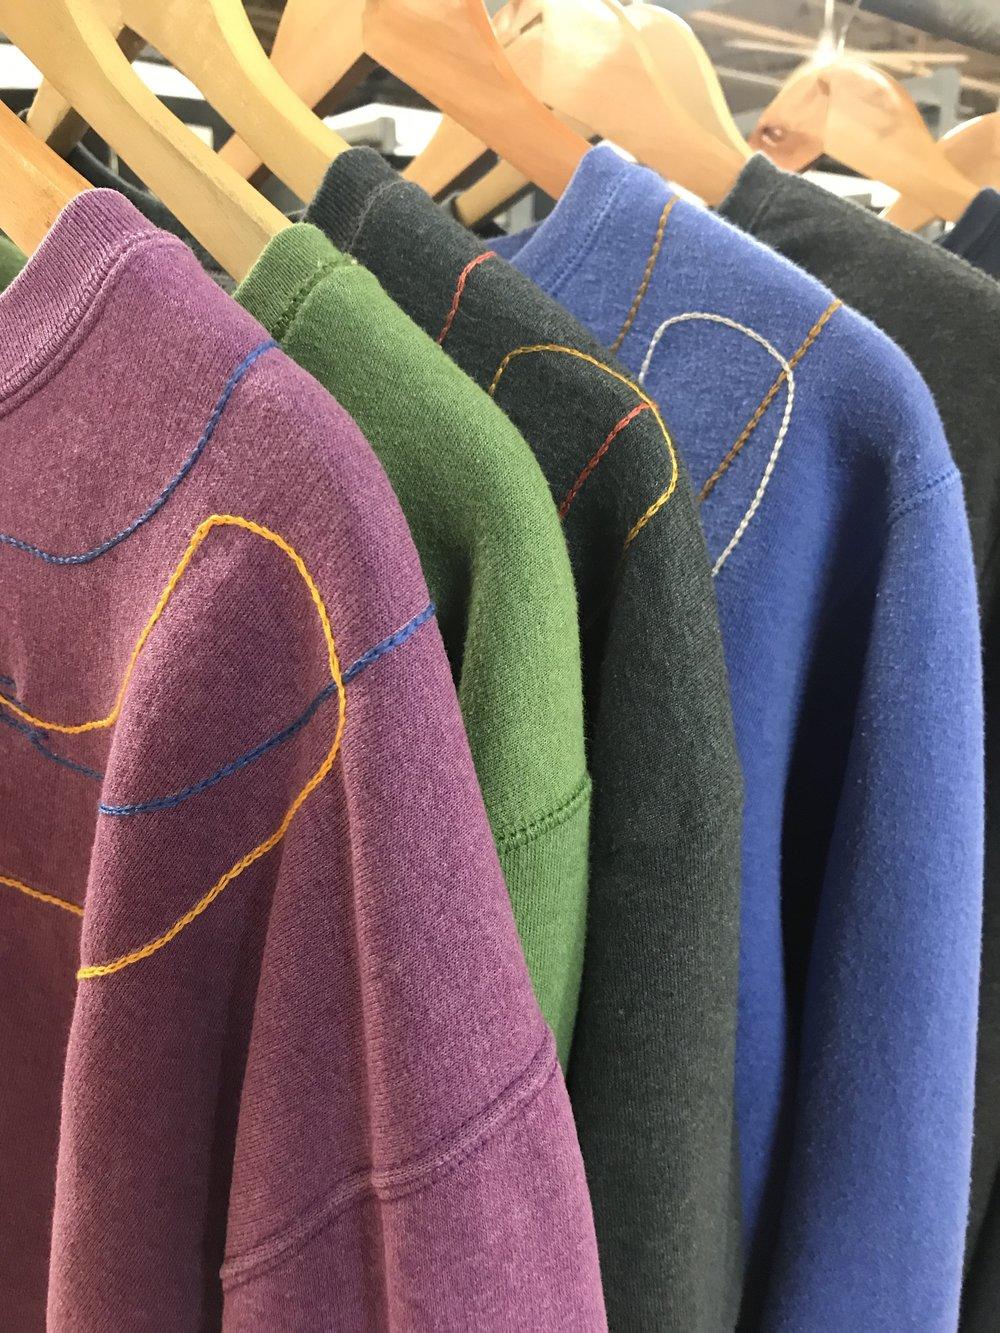 new embroidered sweatshirts in progress